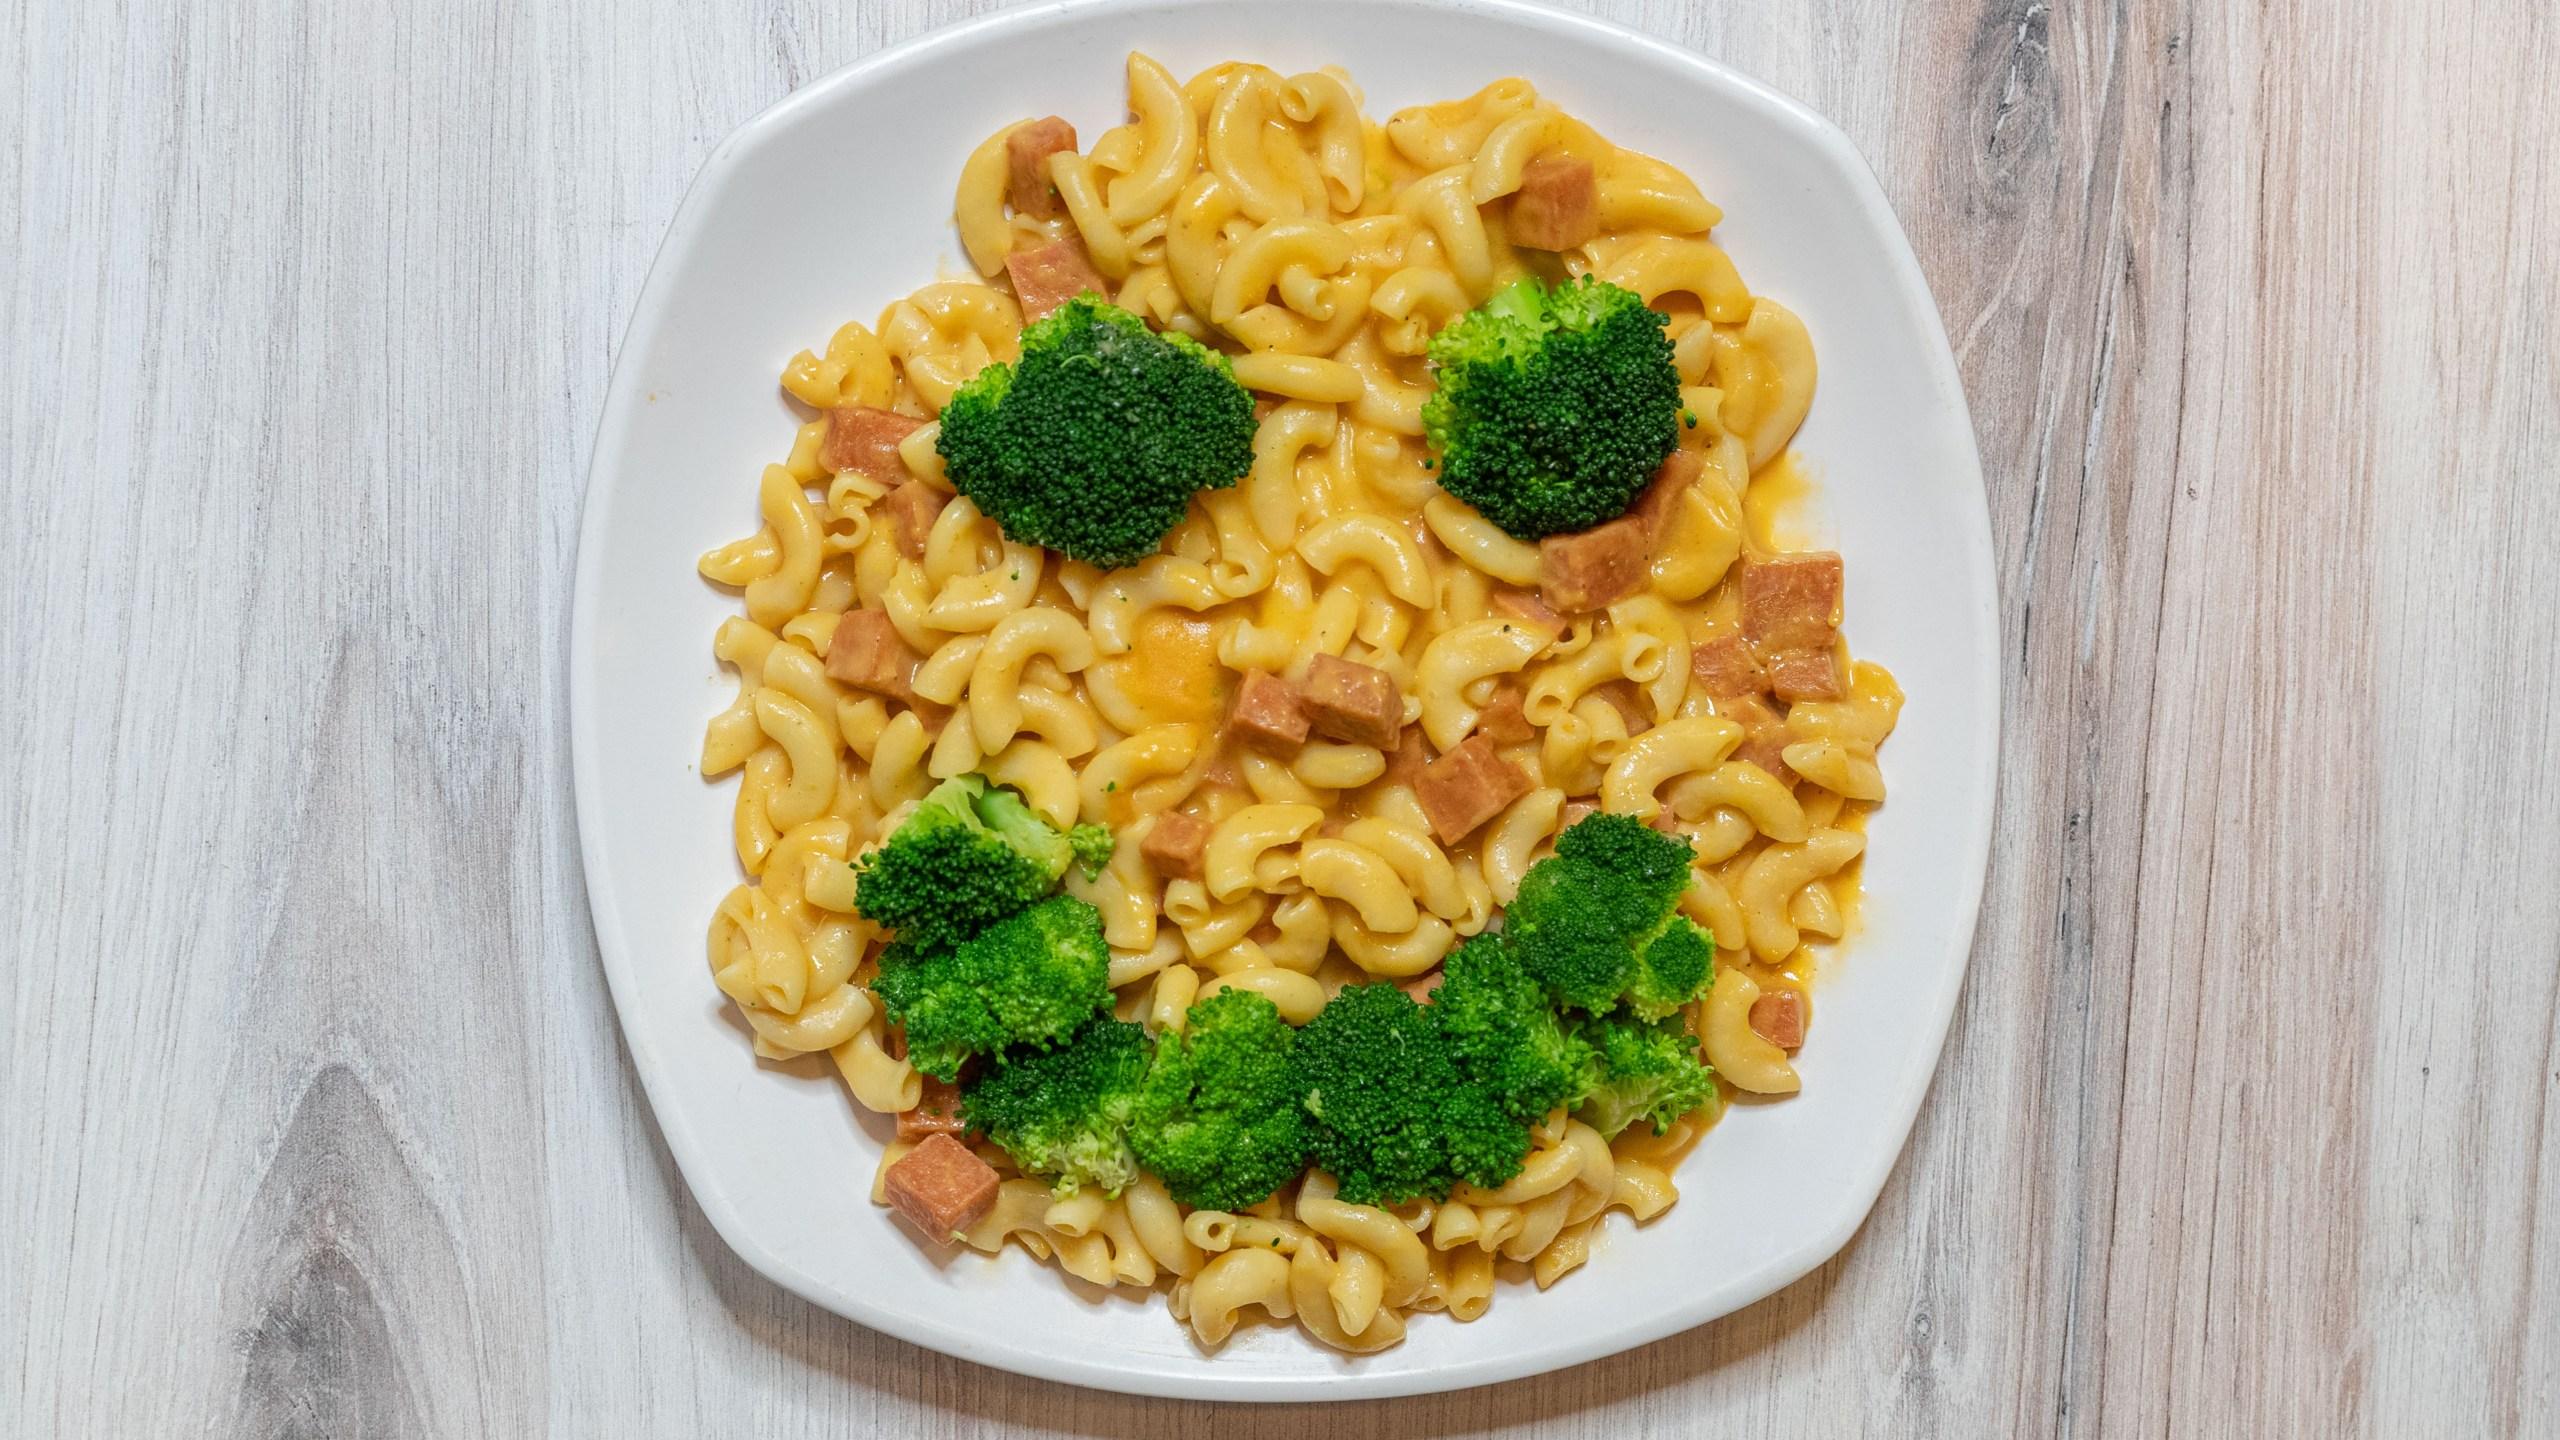 Vegan Restaurant Providing Free Meals